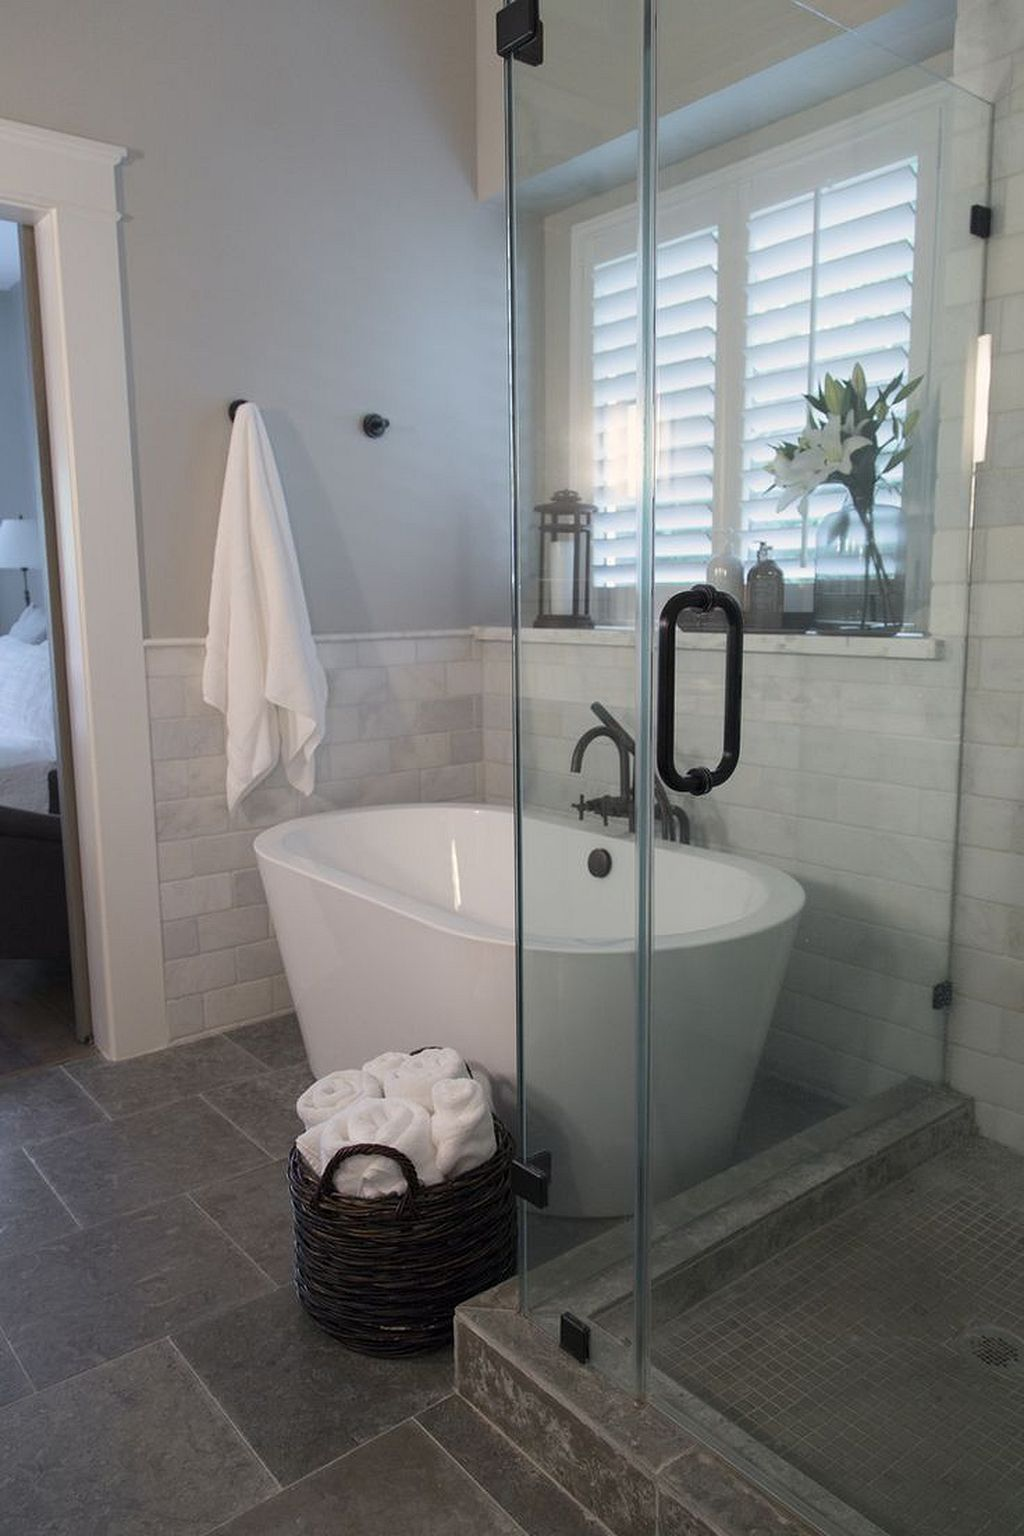 Tiny Bathroom Tub Shower Combo Remodeling Ideas 44 Small Bathroom With Shower Bathroom Remodel Shower Small Master Bathroom